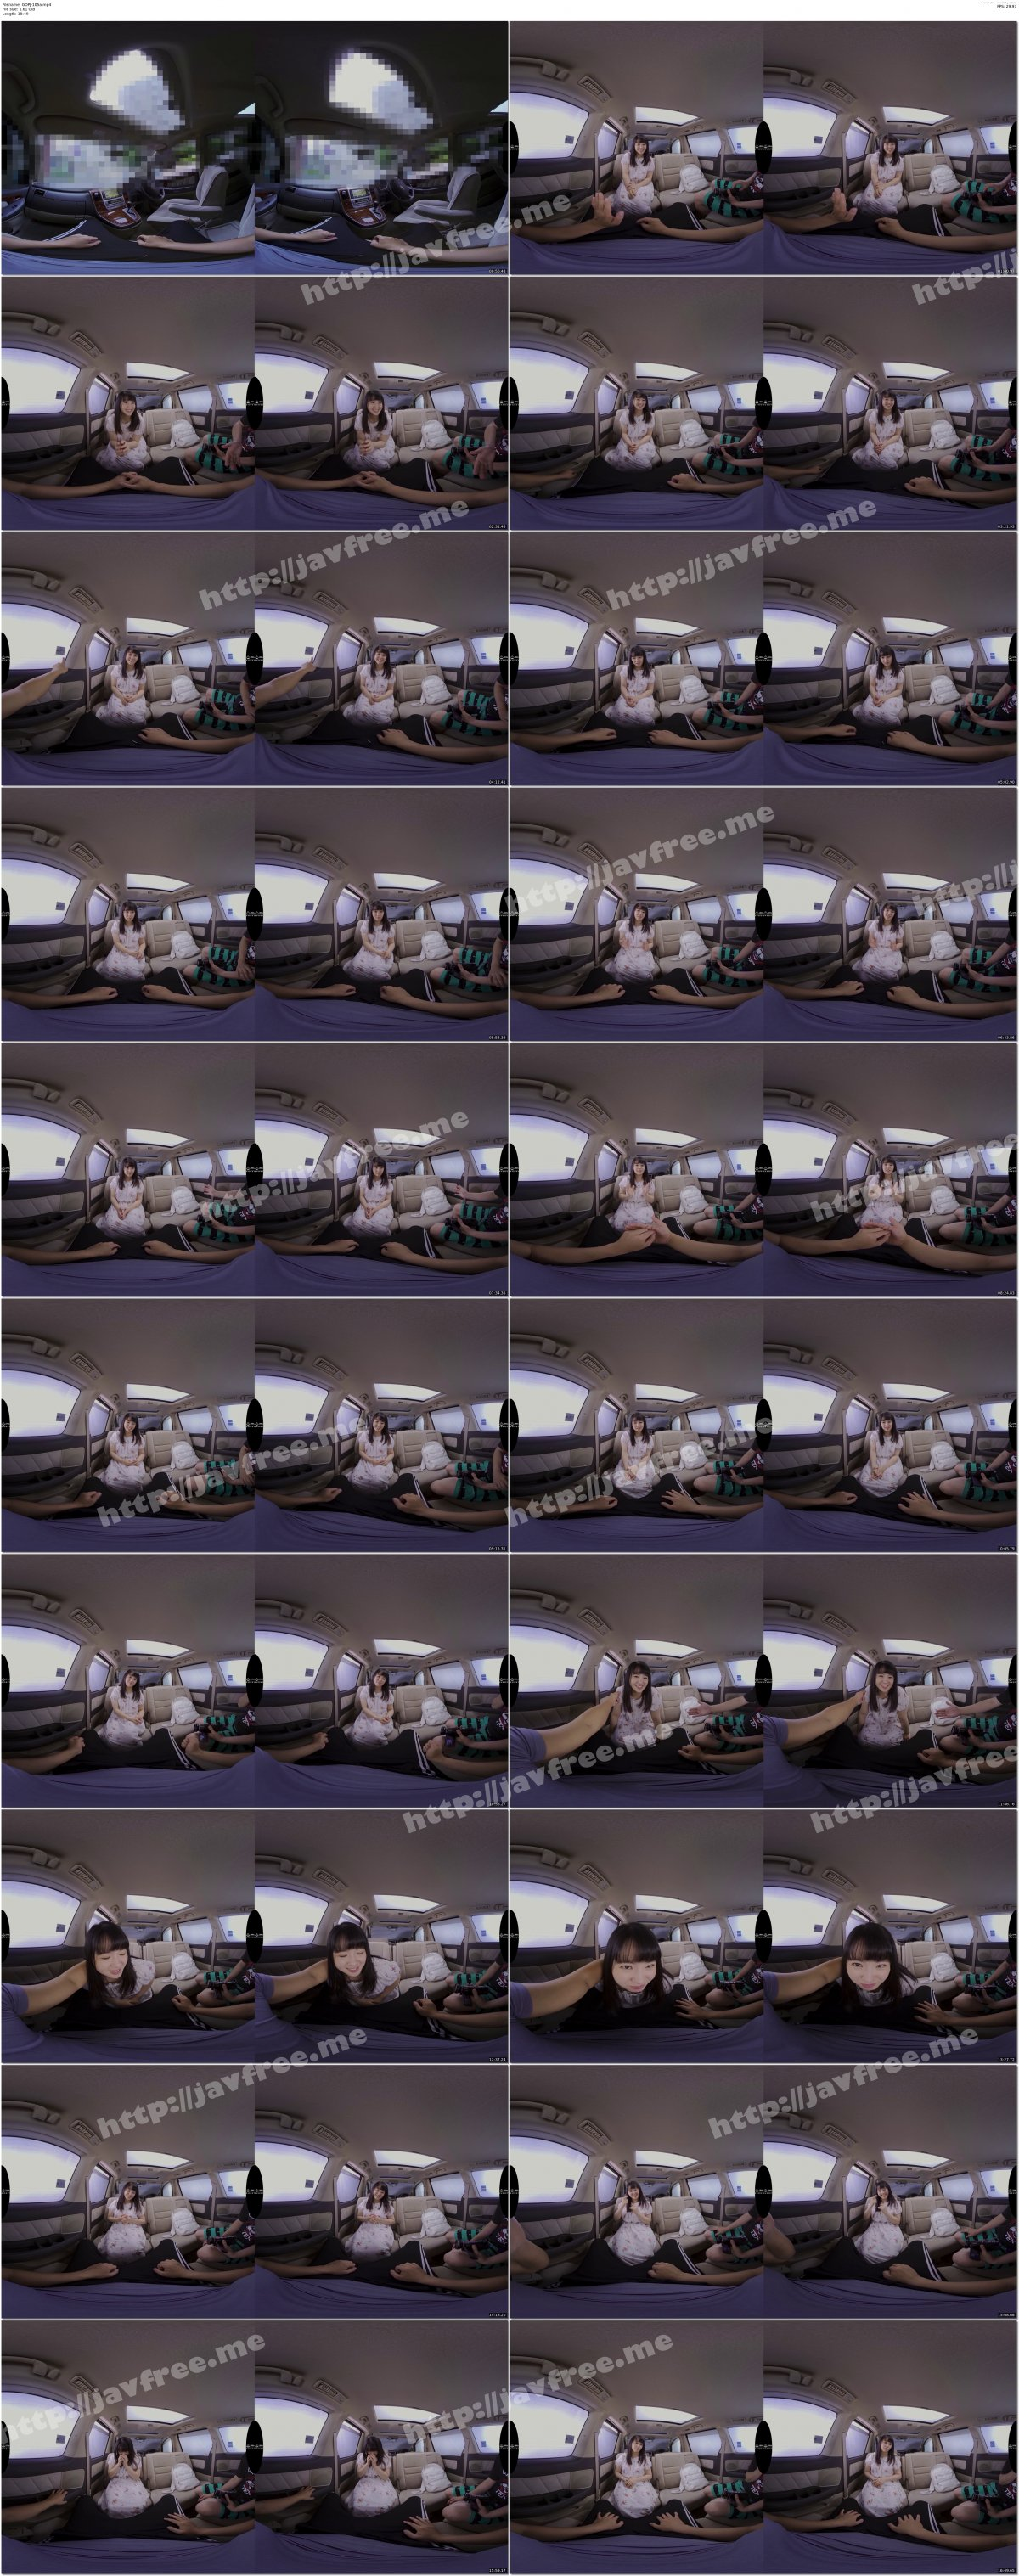 [GOPJ-105] 【VR】劇的高画質 松田真奈 生中出し ナンパして車内でヤッちゃえ!激カワ巨乳娘GET 3 - image GOPJ-105a on https://javfree.me